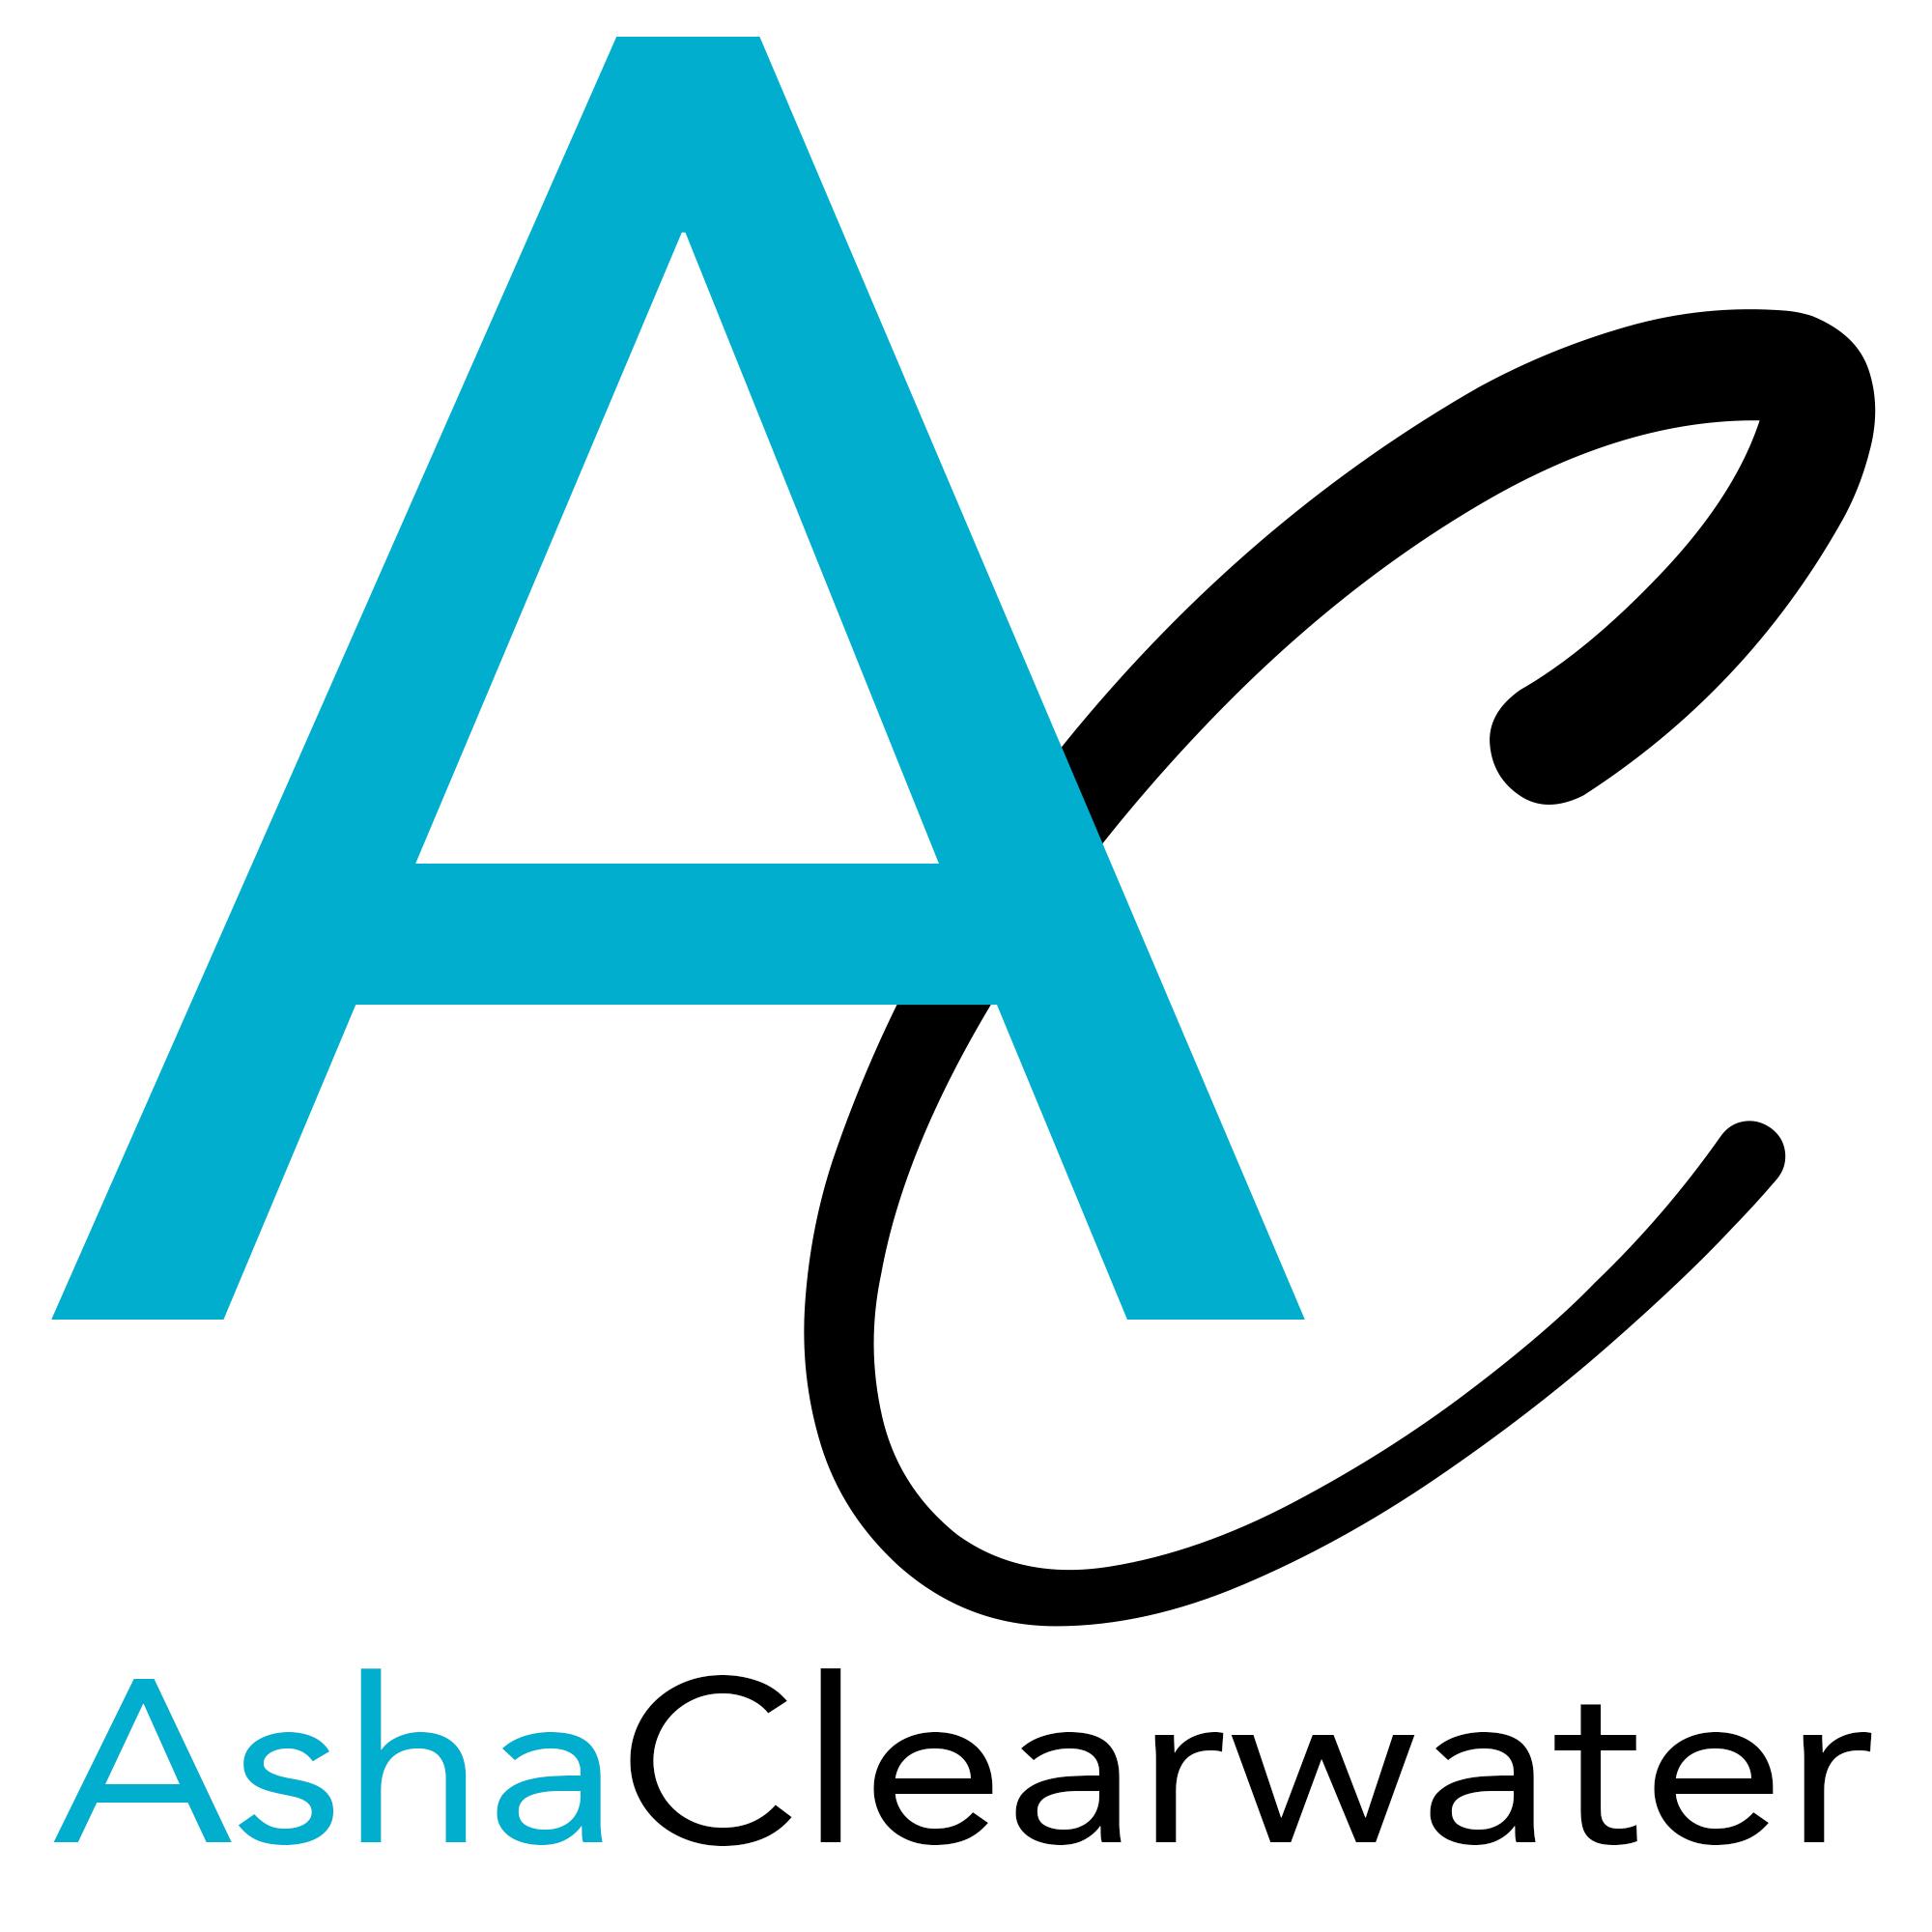 Asha Clearwater